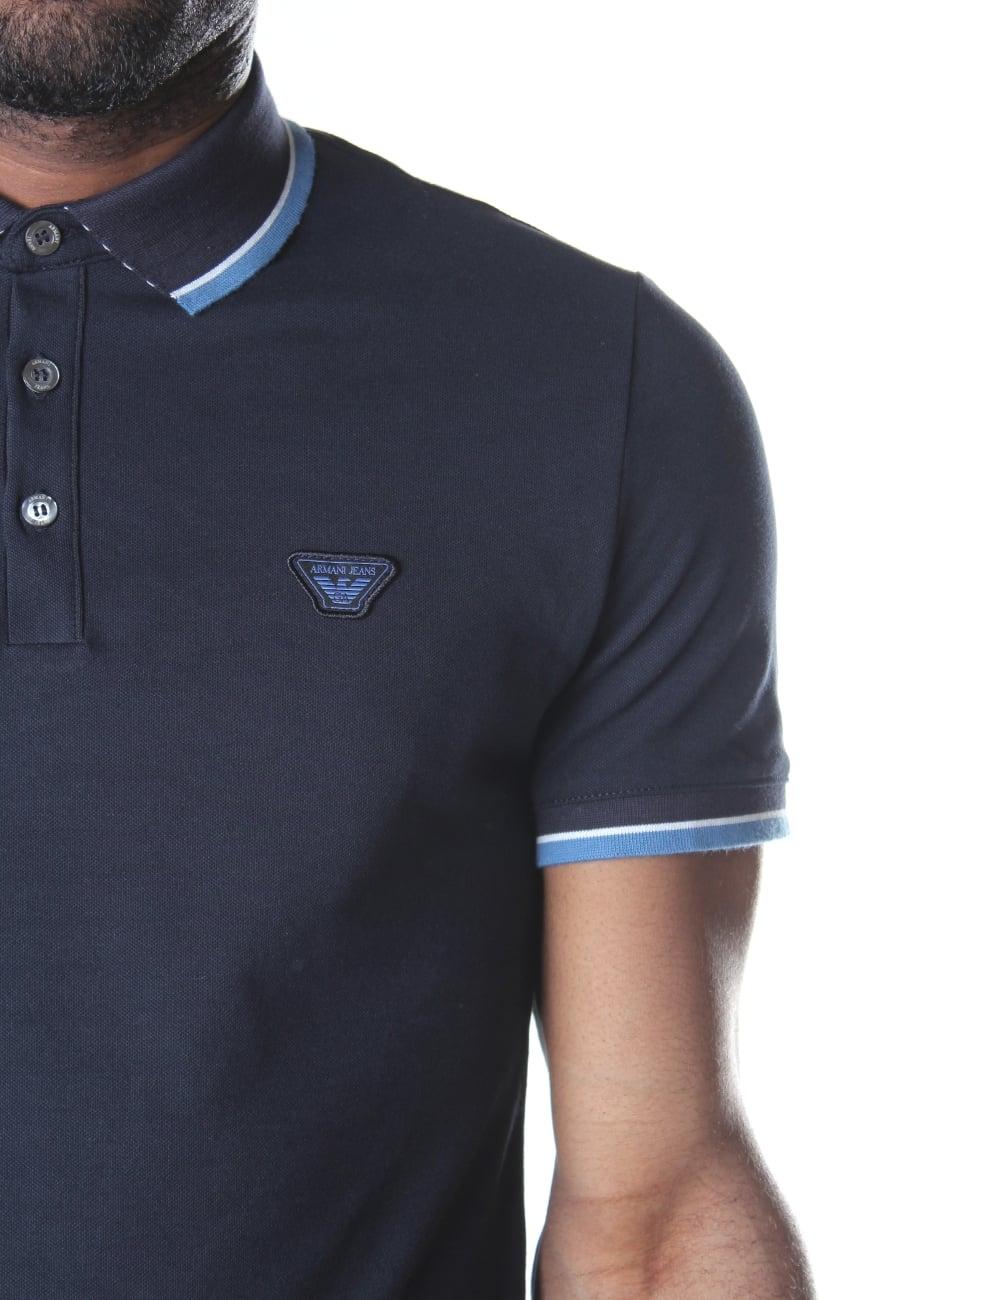 89919cba ... Armani Jeans Men's Tipped Short Sleeve Polo Top. Tap image to zoom.  Men's Tipped Short Sleeve ...